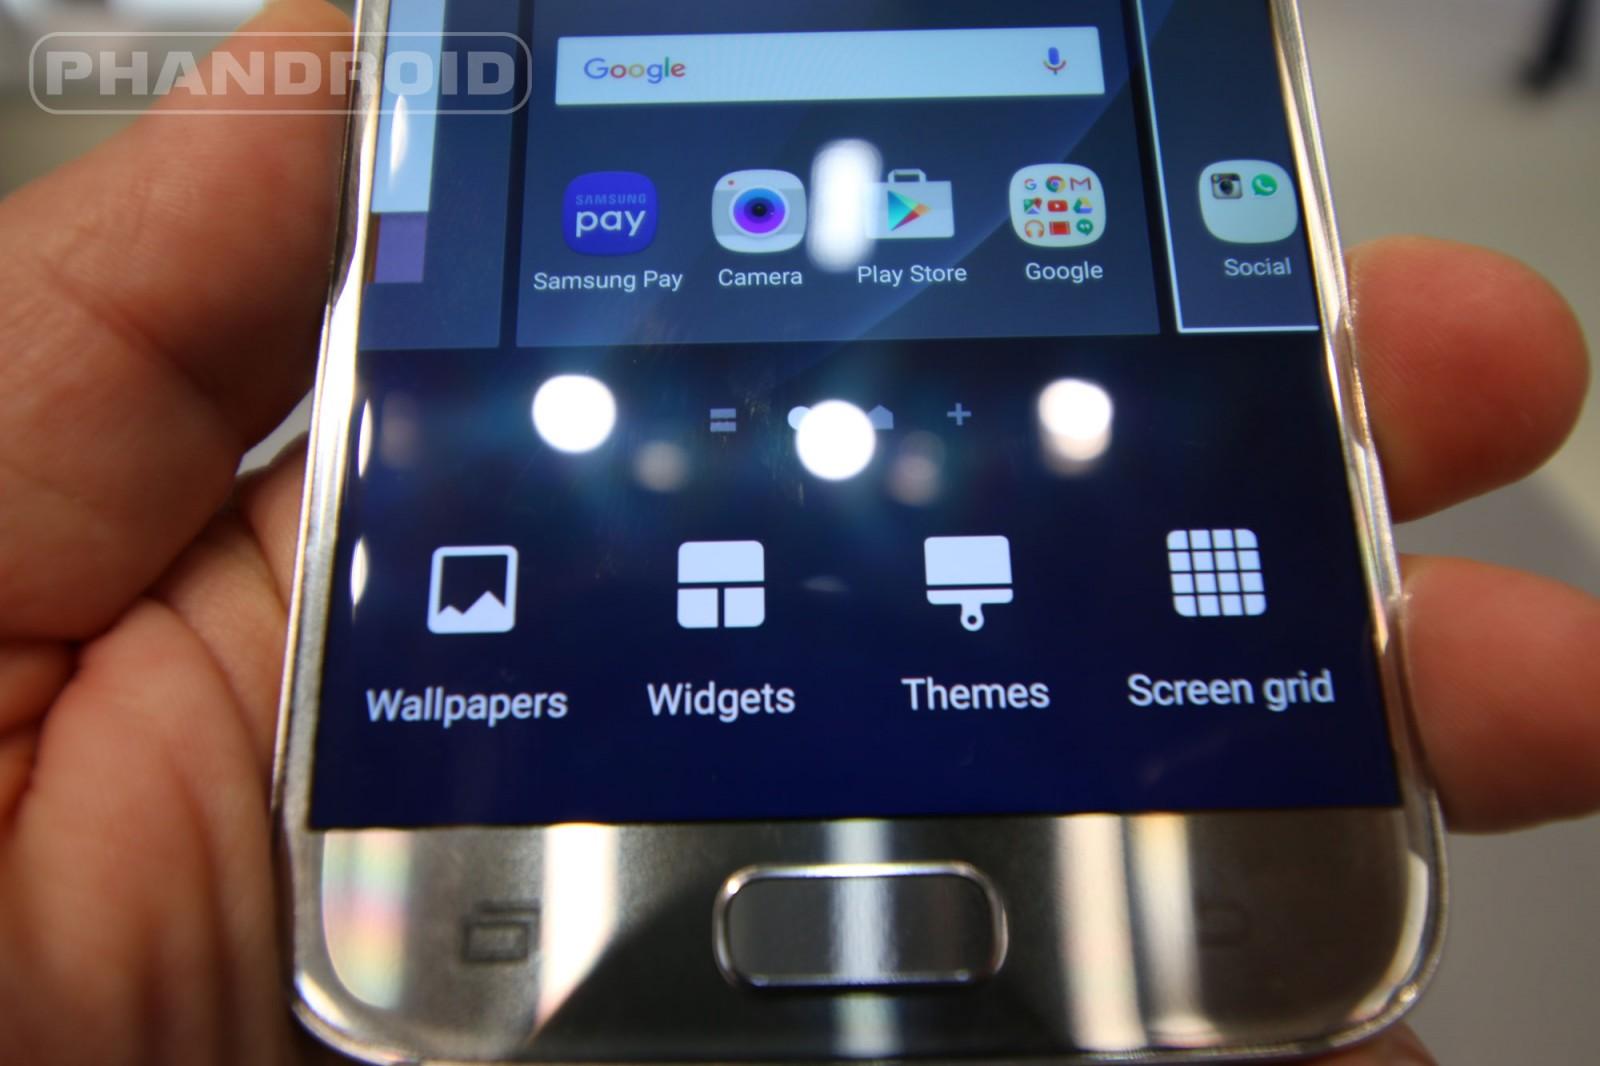 Google themes mobile9 - Free Samsung Hd Wallpapers Mobile9